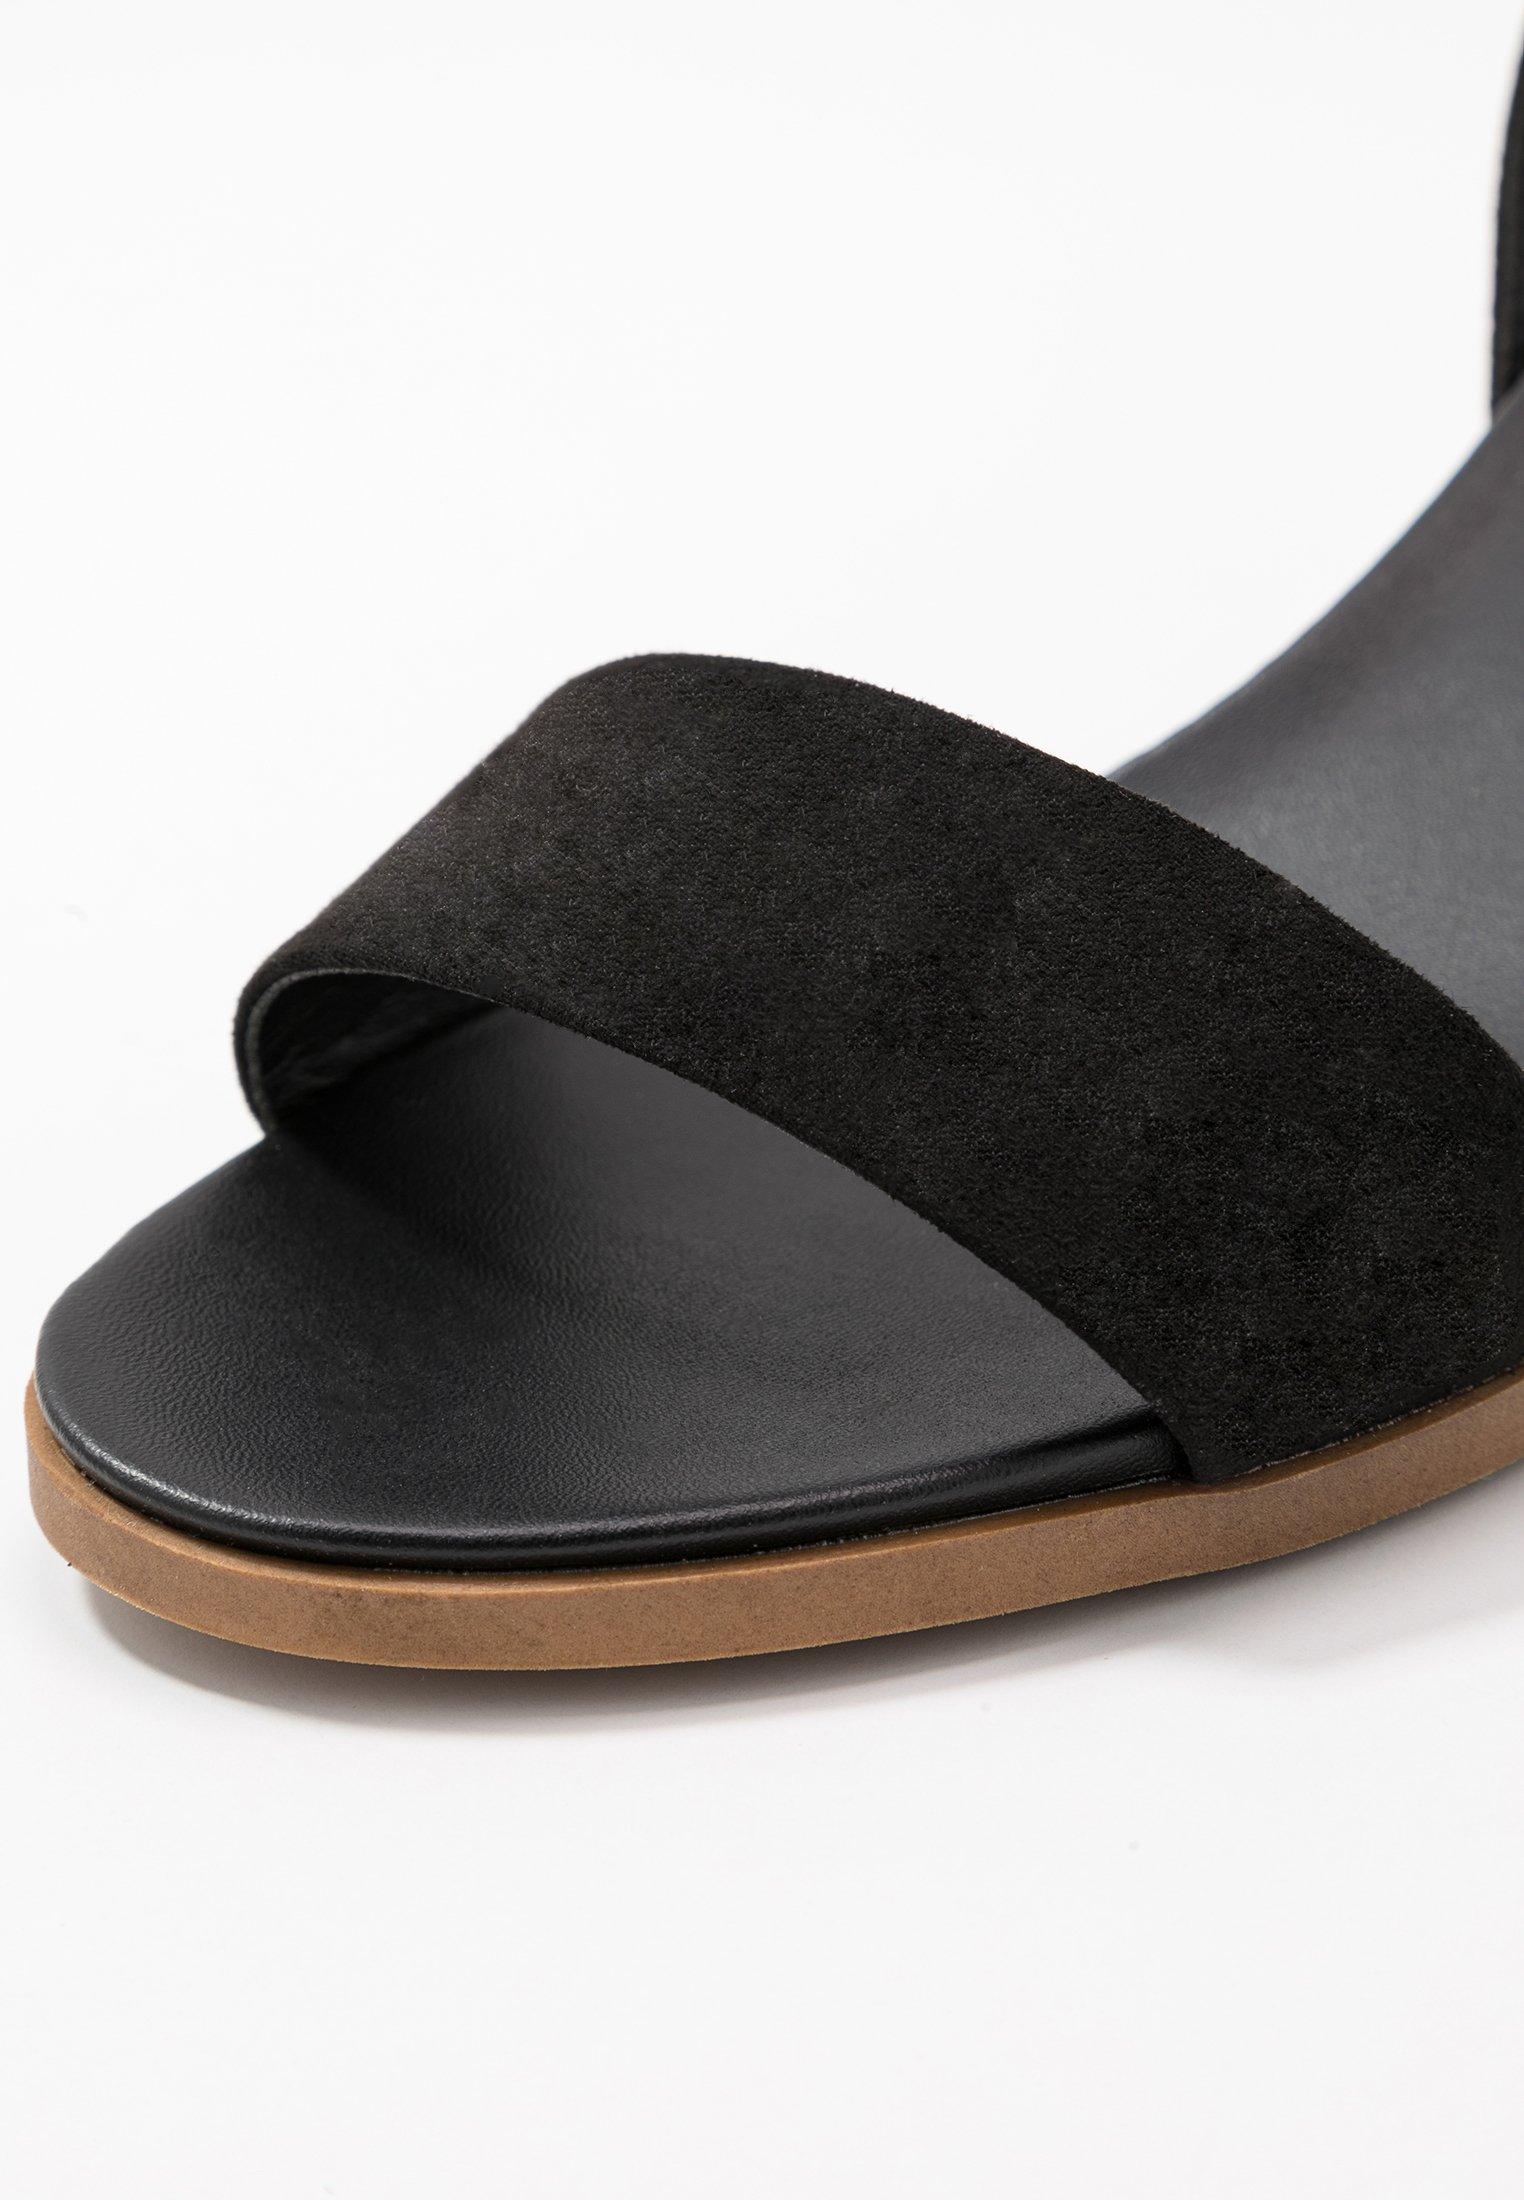 Perkins HeelSandales Black Comfort Fit Dorothy Wide Footbed Stack 67Ygbfy